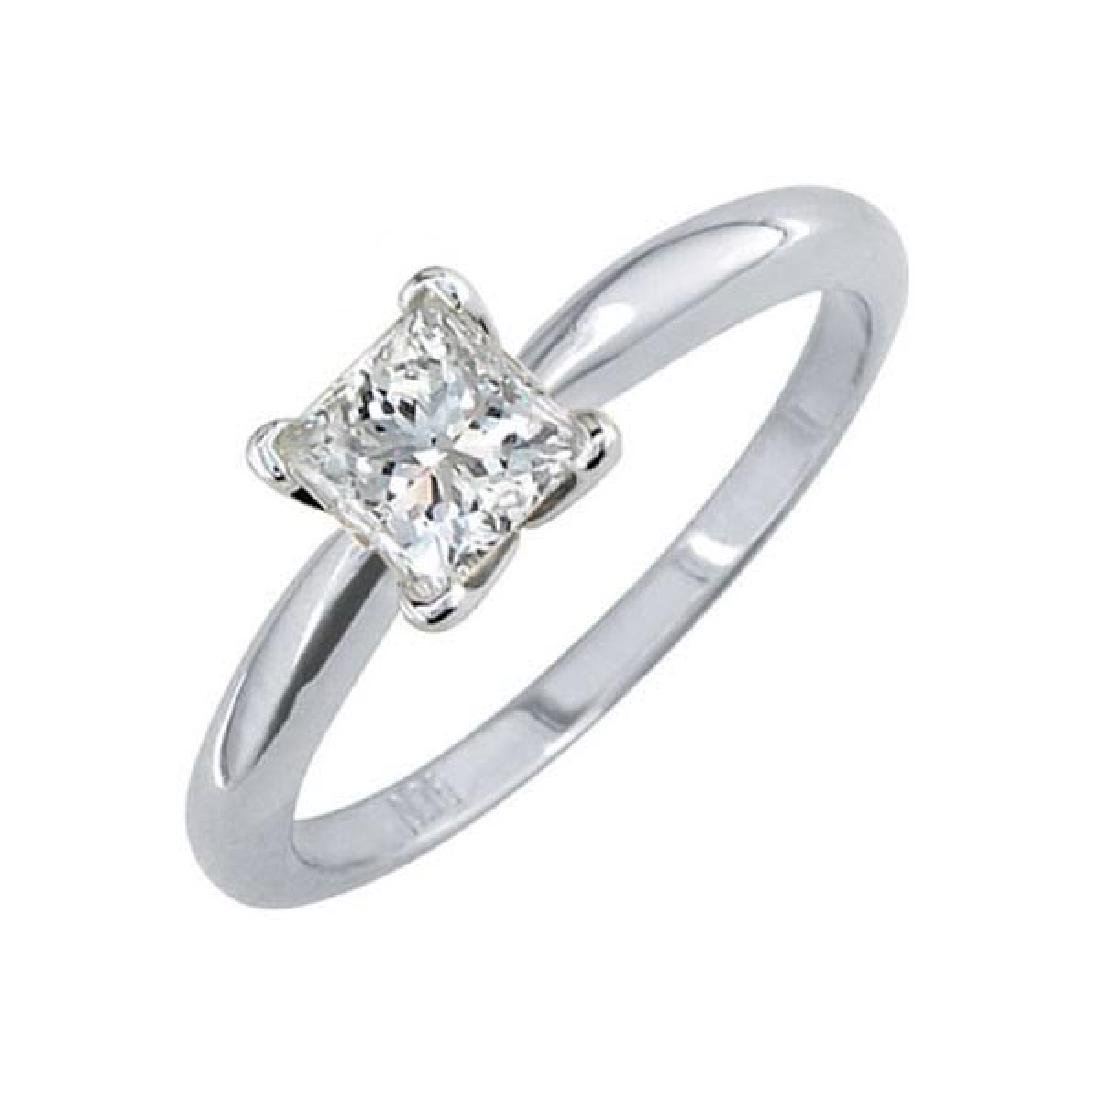 Certified 0.64 CTW Princess Diamond Solitaire 14k Ring